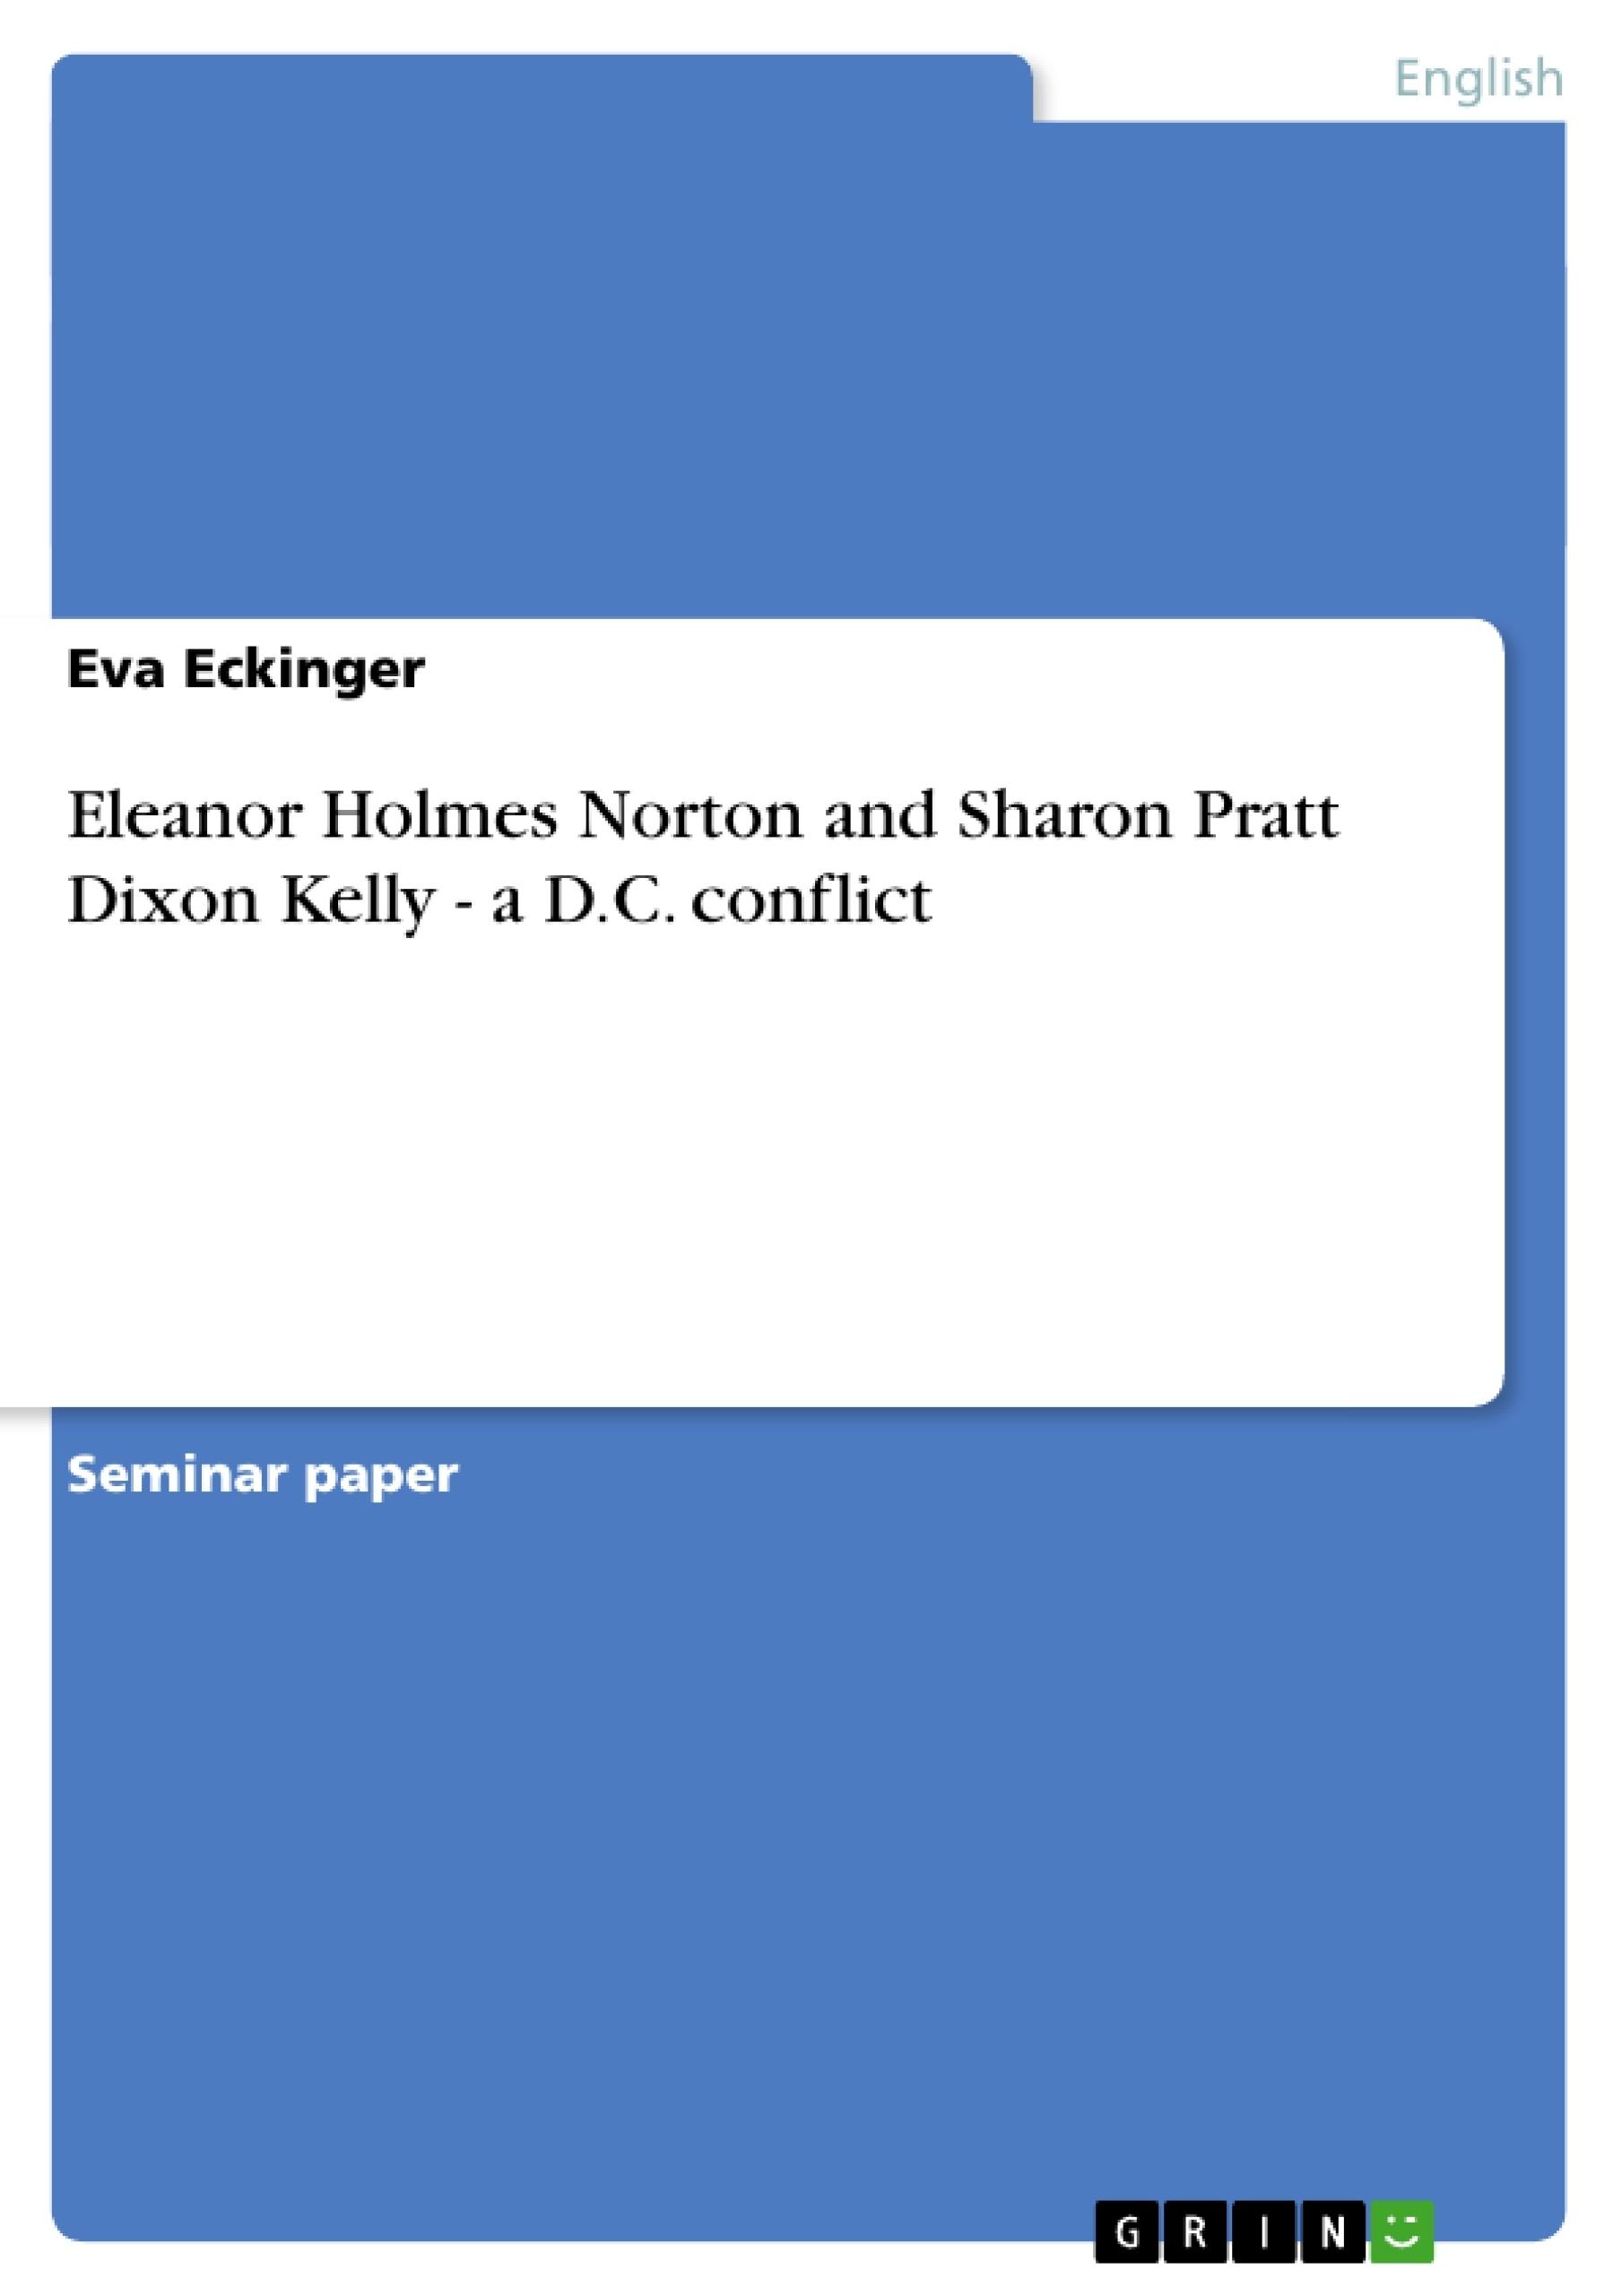 Title: Eleanor Holmes Norton and Sharon Pratt Dixon Kelly - a D.C. conflict